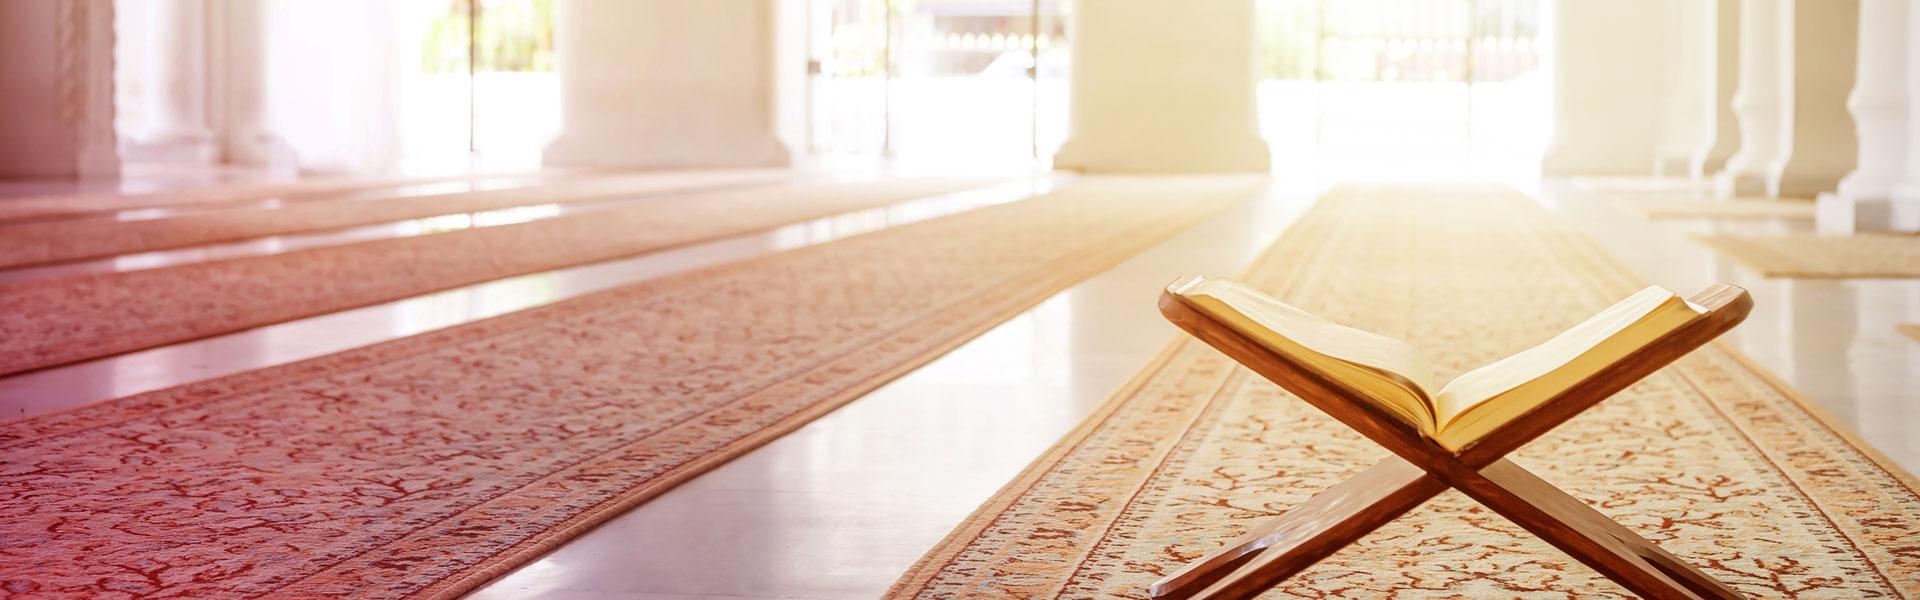 Gestion actif islamique